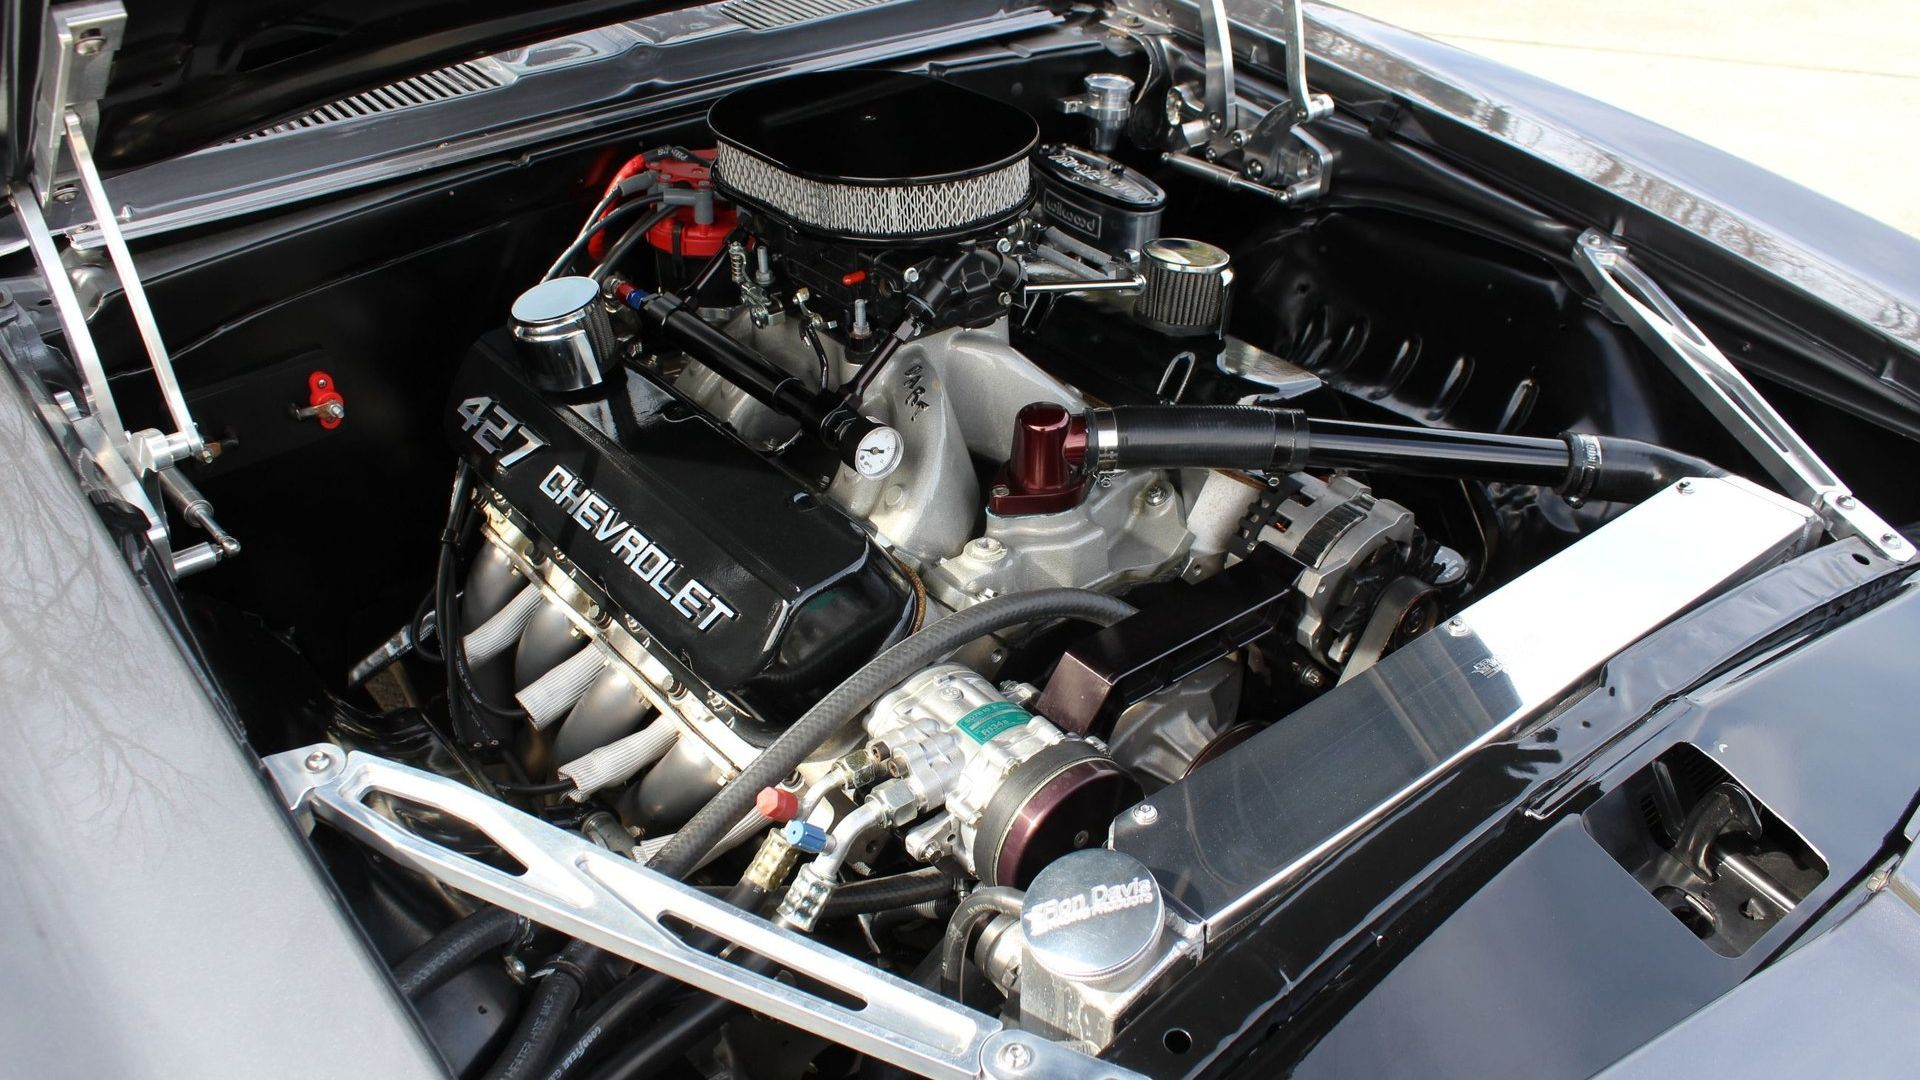 Light 'Em Up With This Potent 1969 Chevy Camaro Restomod